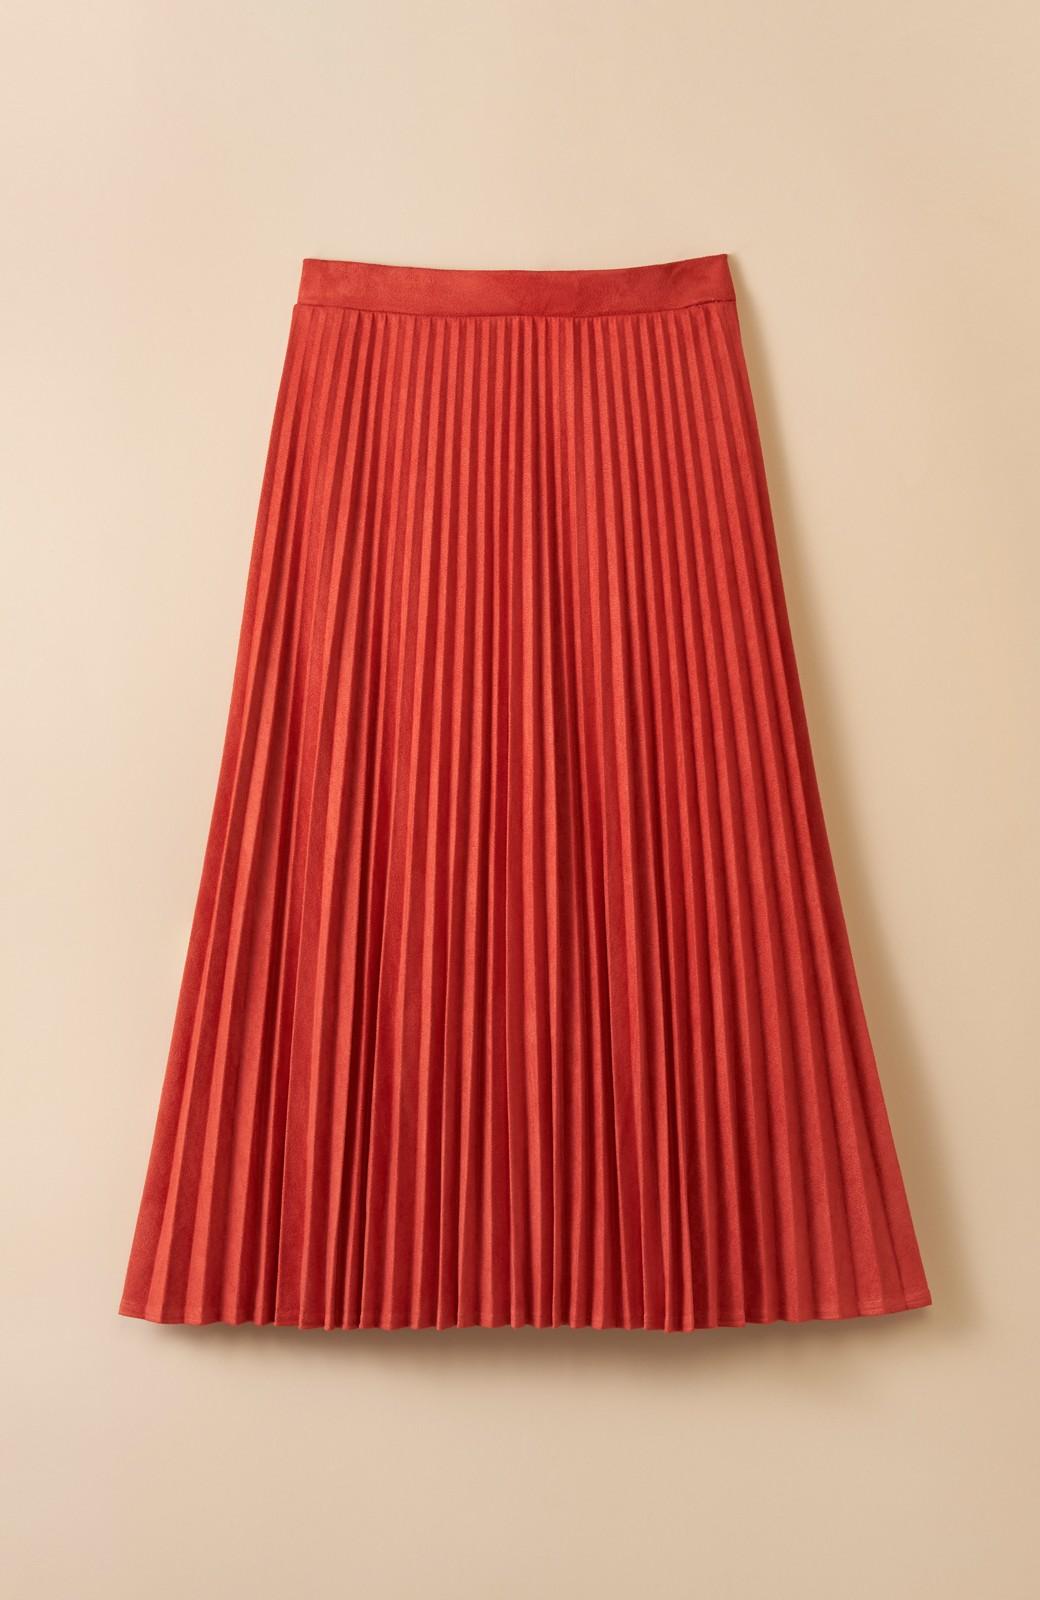 haco! 楽して女っぽい フェイクスエードのプリーツスカート  by que made me <オレンジ系その他>の商品写真1